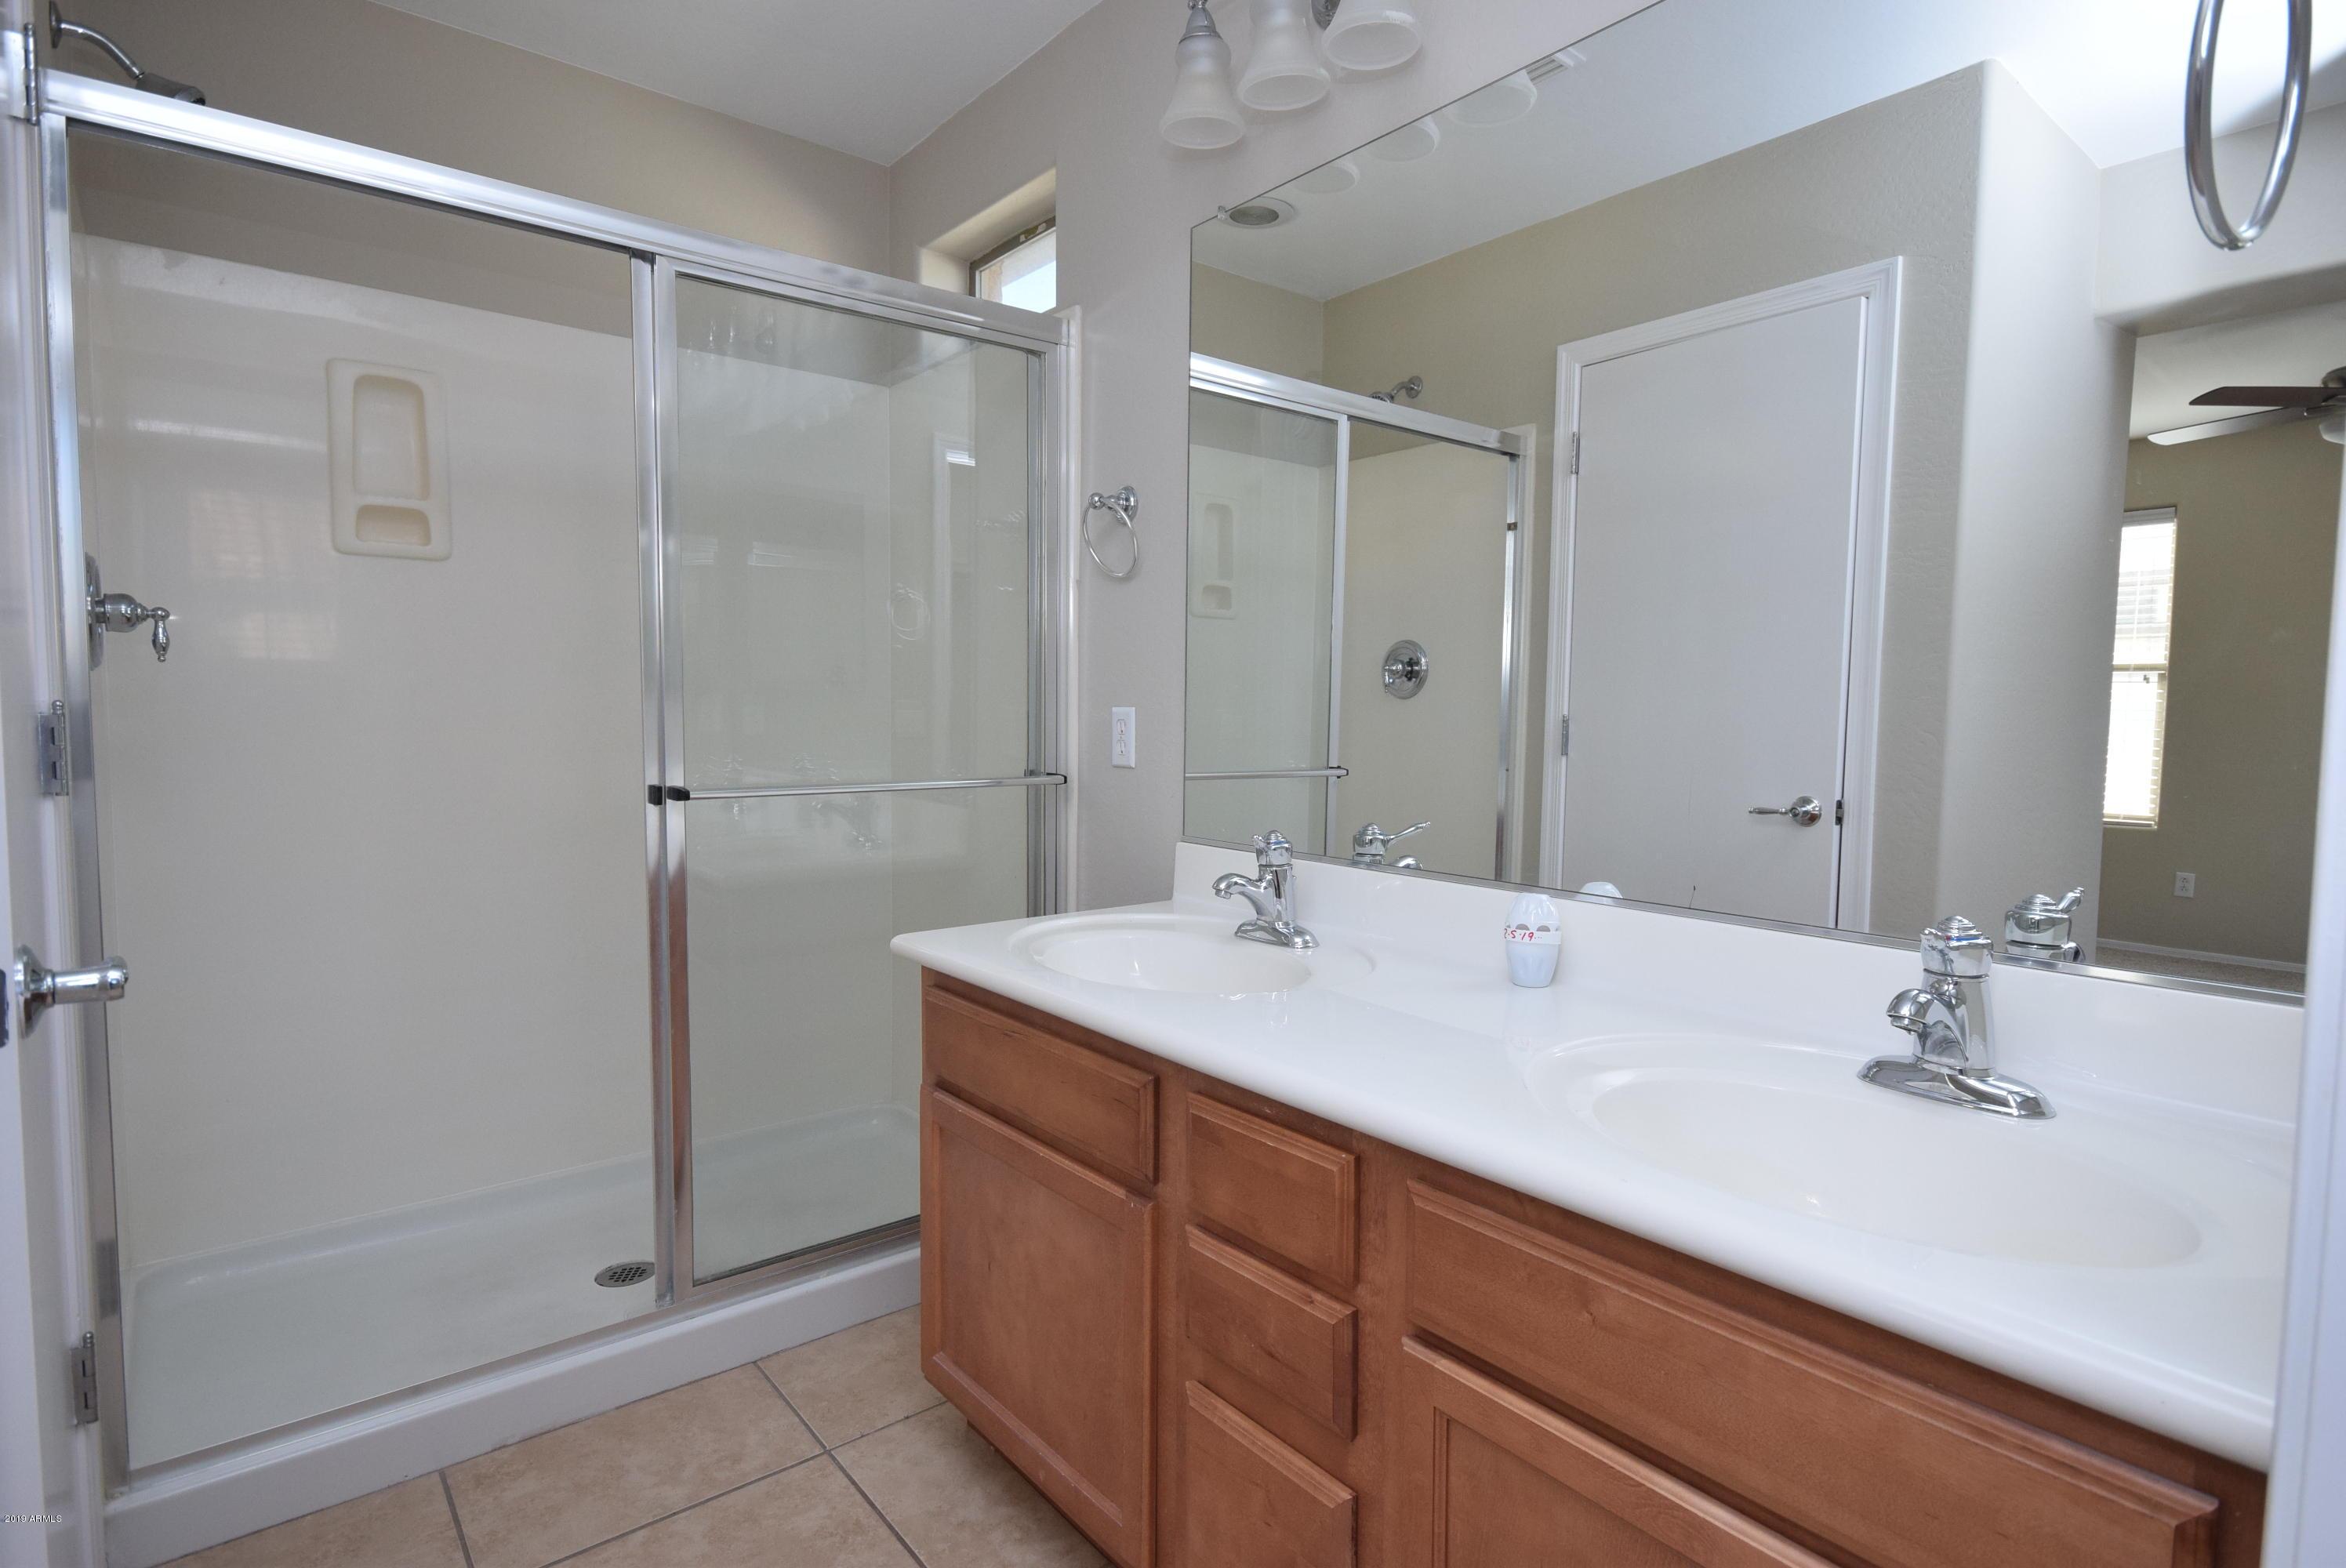 MLS 5881132 8337 W LEWIS Avenue, Phoenix, AZ 85037 Phoenix AZ REO Bank Owned Foreclosure